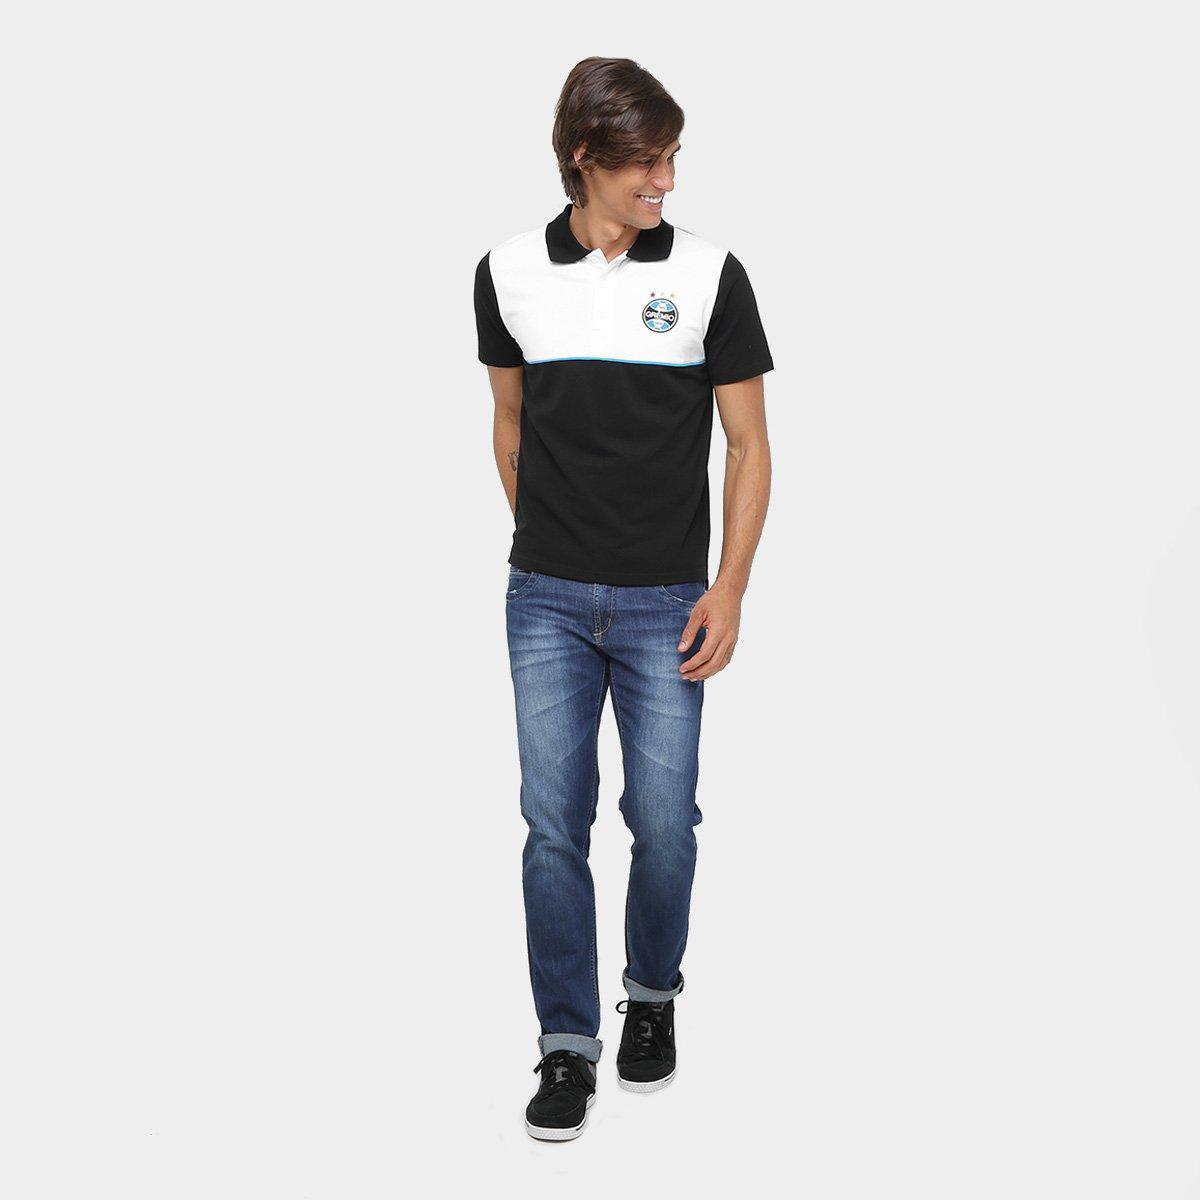 Camisa Polo Grêmio Masculina - Tam: P - 2